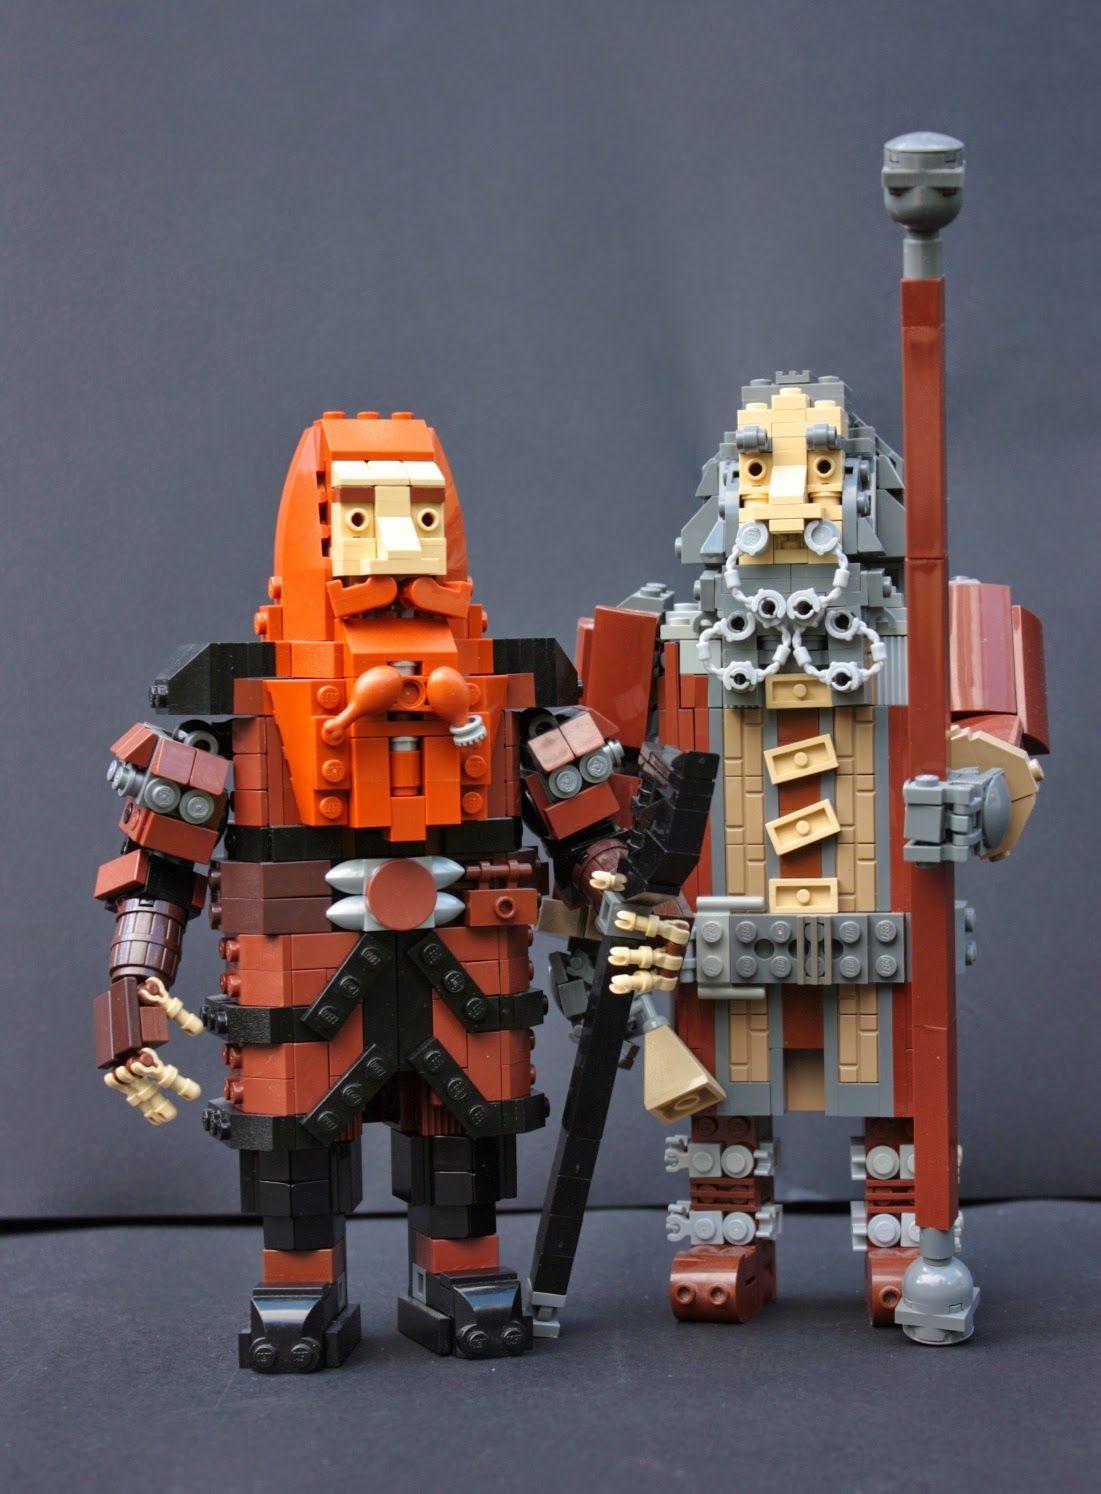 Hobbitsplosion part IV: The Company of Thorin Oakenshield   Cyclopic Bricks